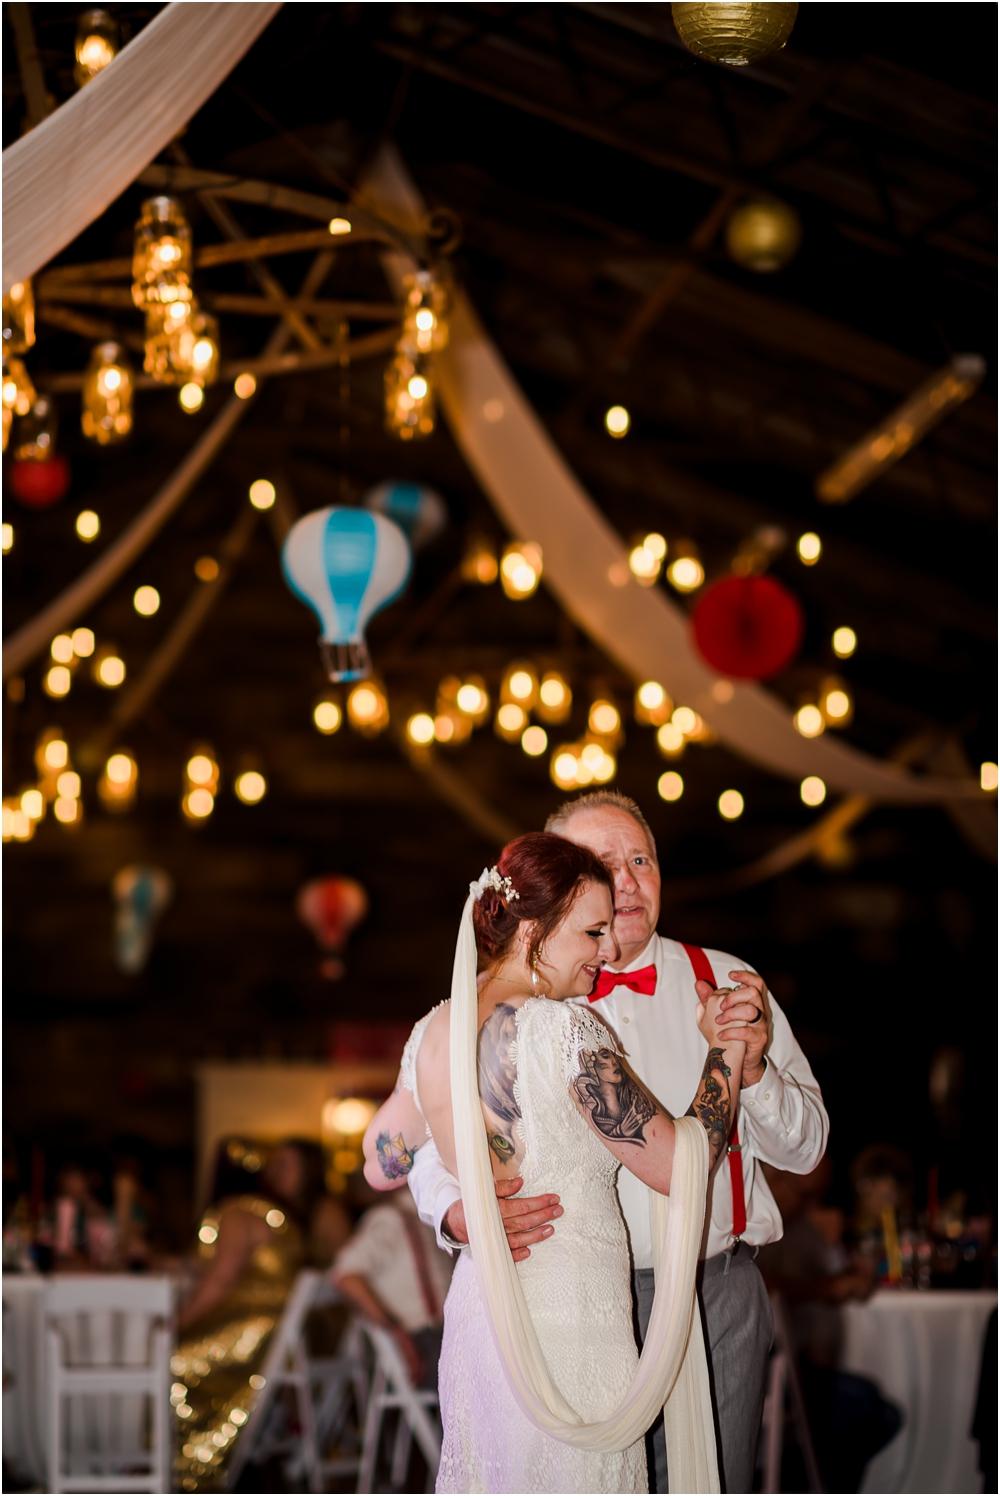 the-barn-at-wateroaks-circus-florida-wedding-photographer-kiersten-stevenson-photography-126.jpg